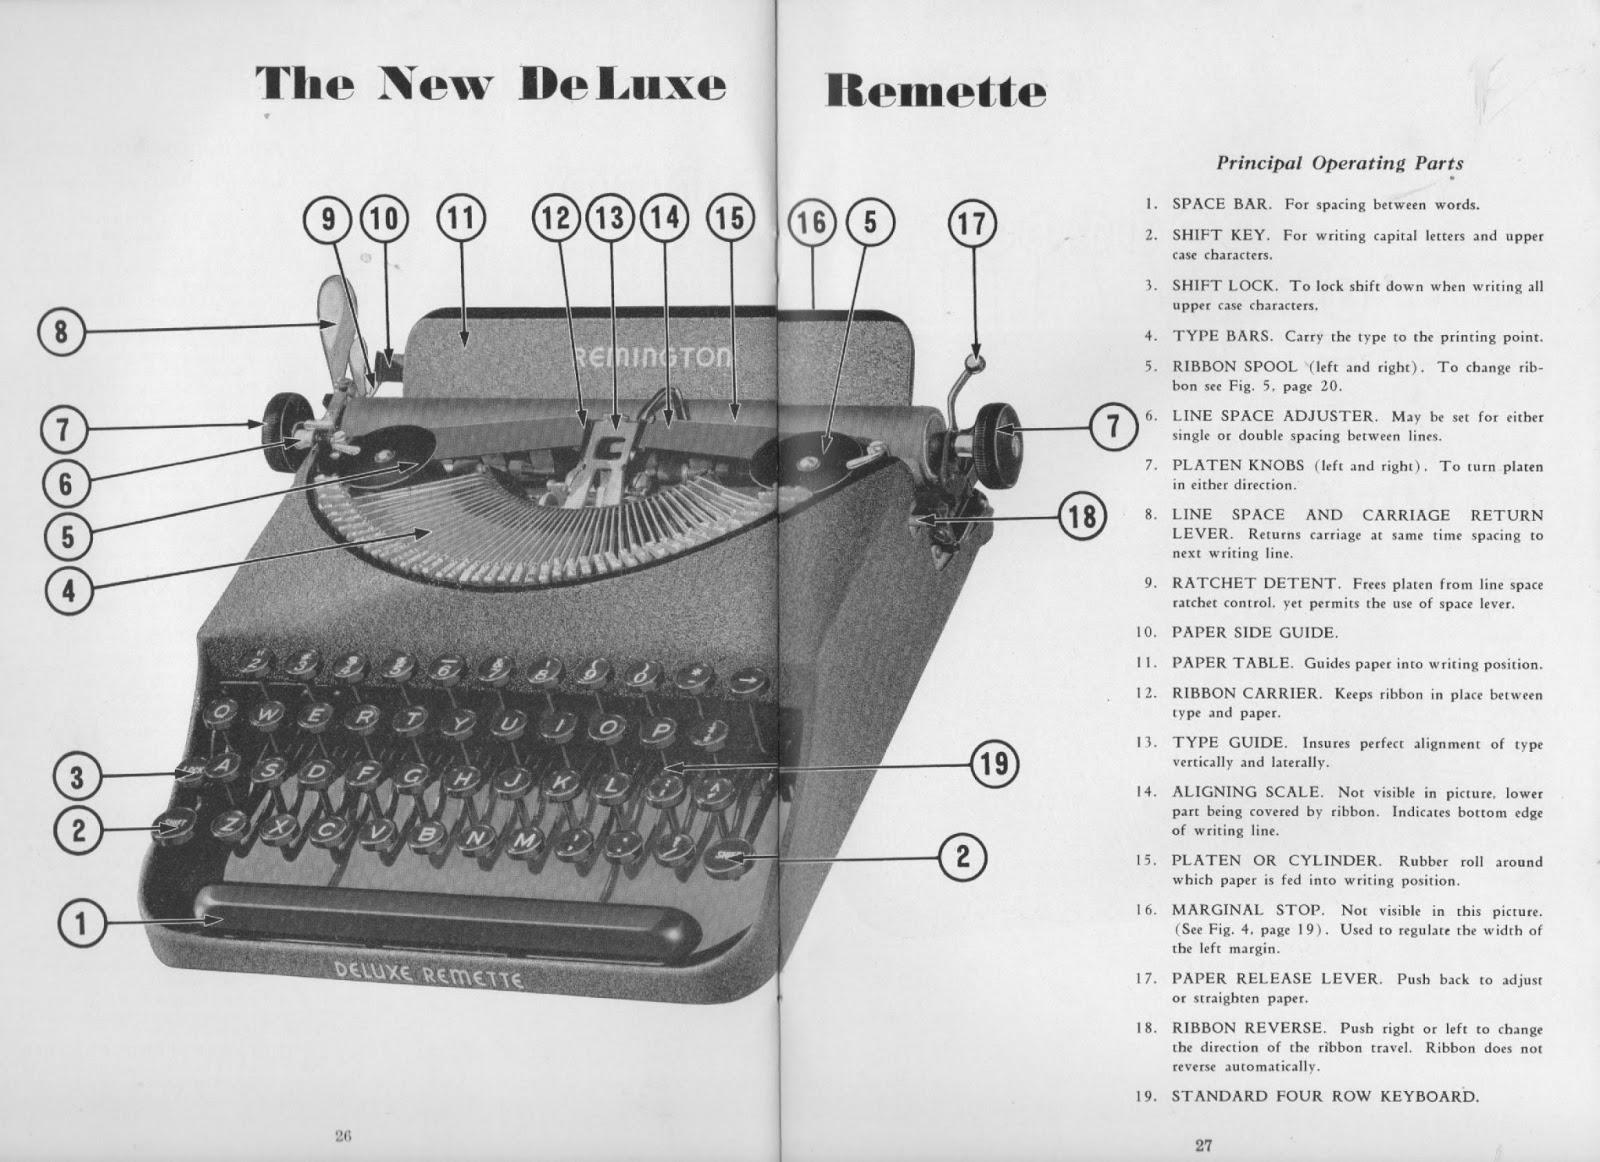 manual typewriter diagram rosemount pressure transmitter wiring seattle firs remington deluxe remette features